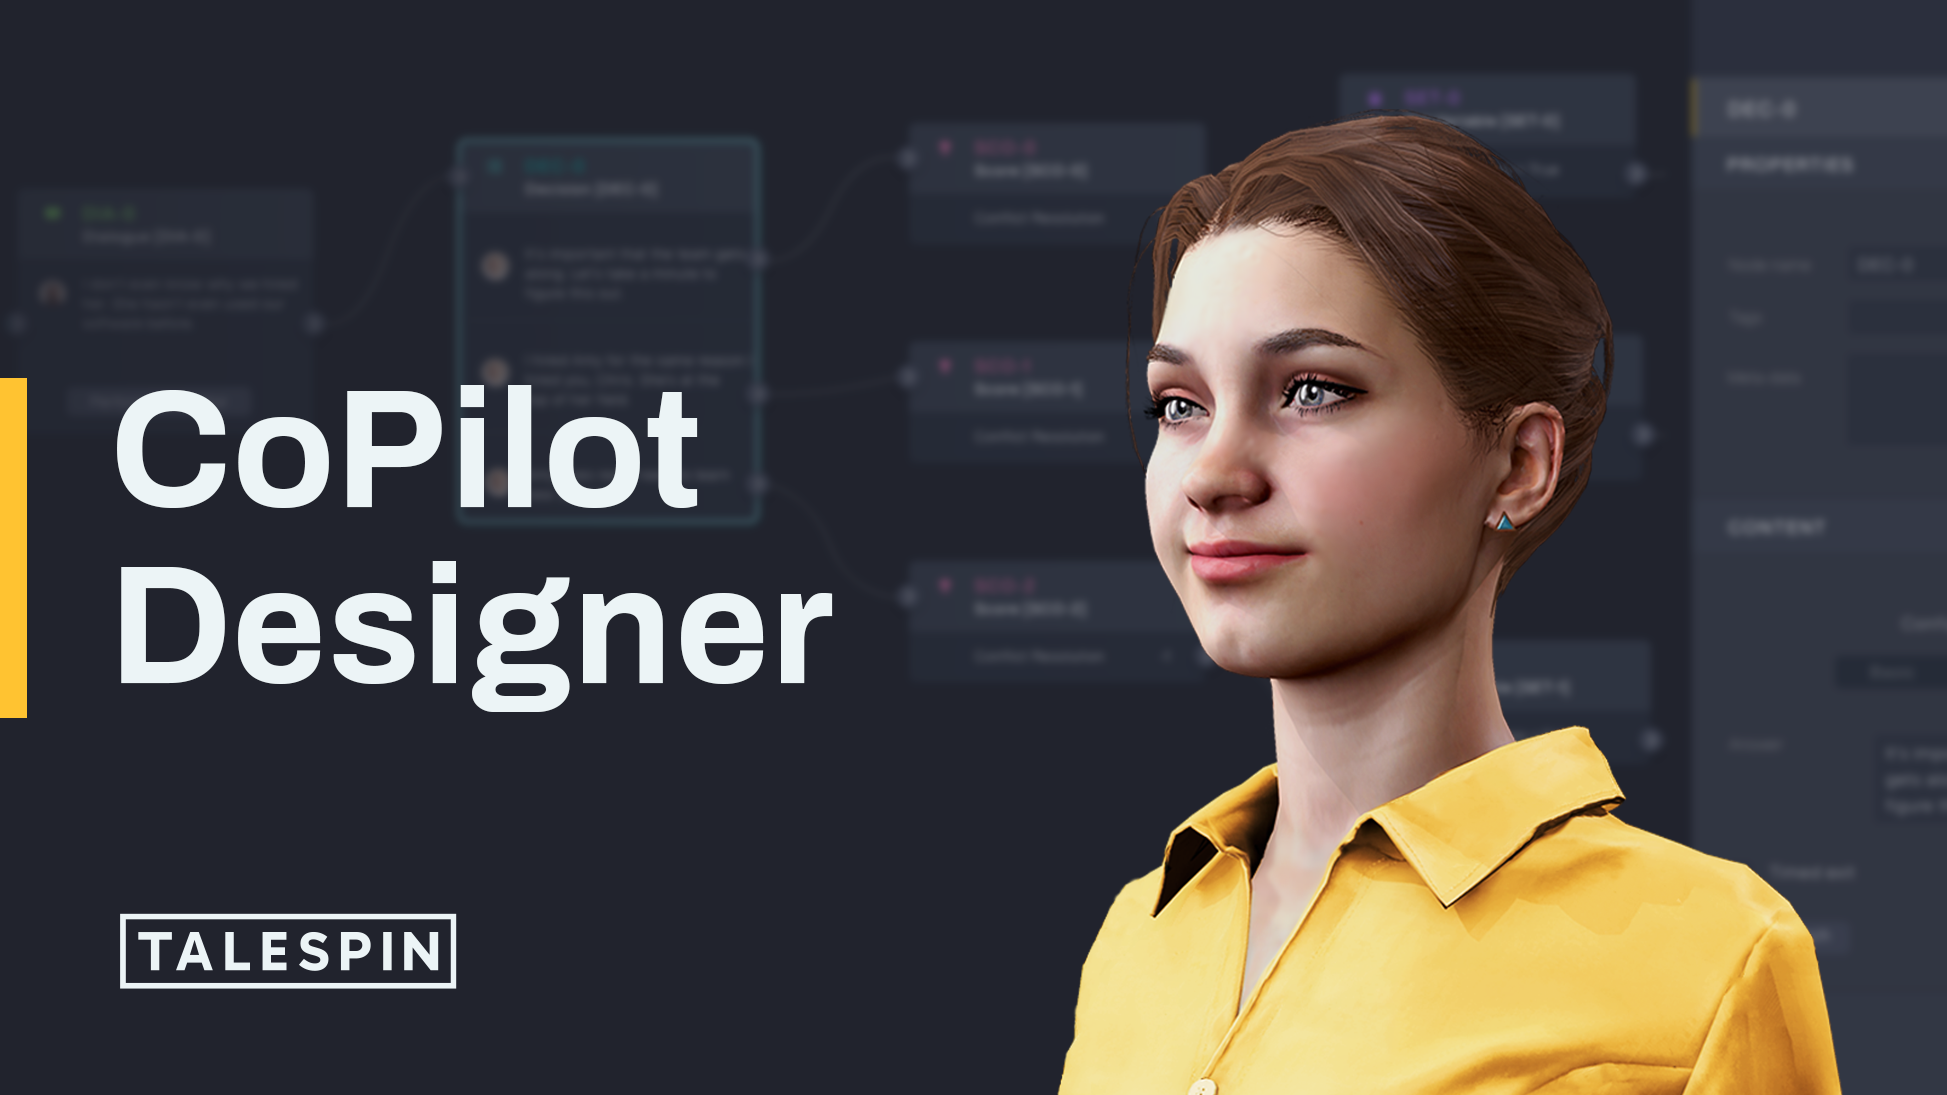 CoPilot Designer by Talespin partner